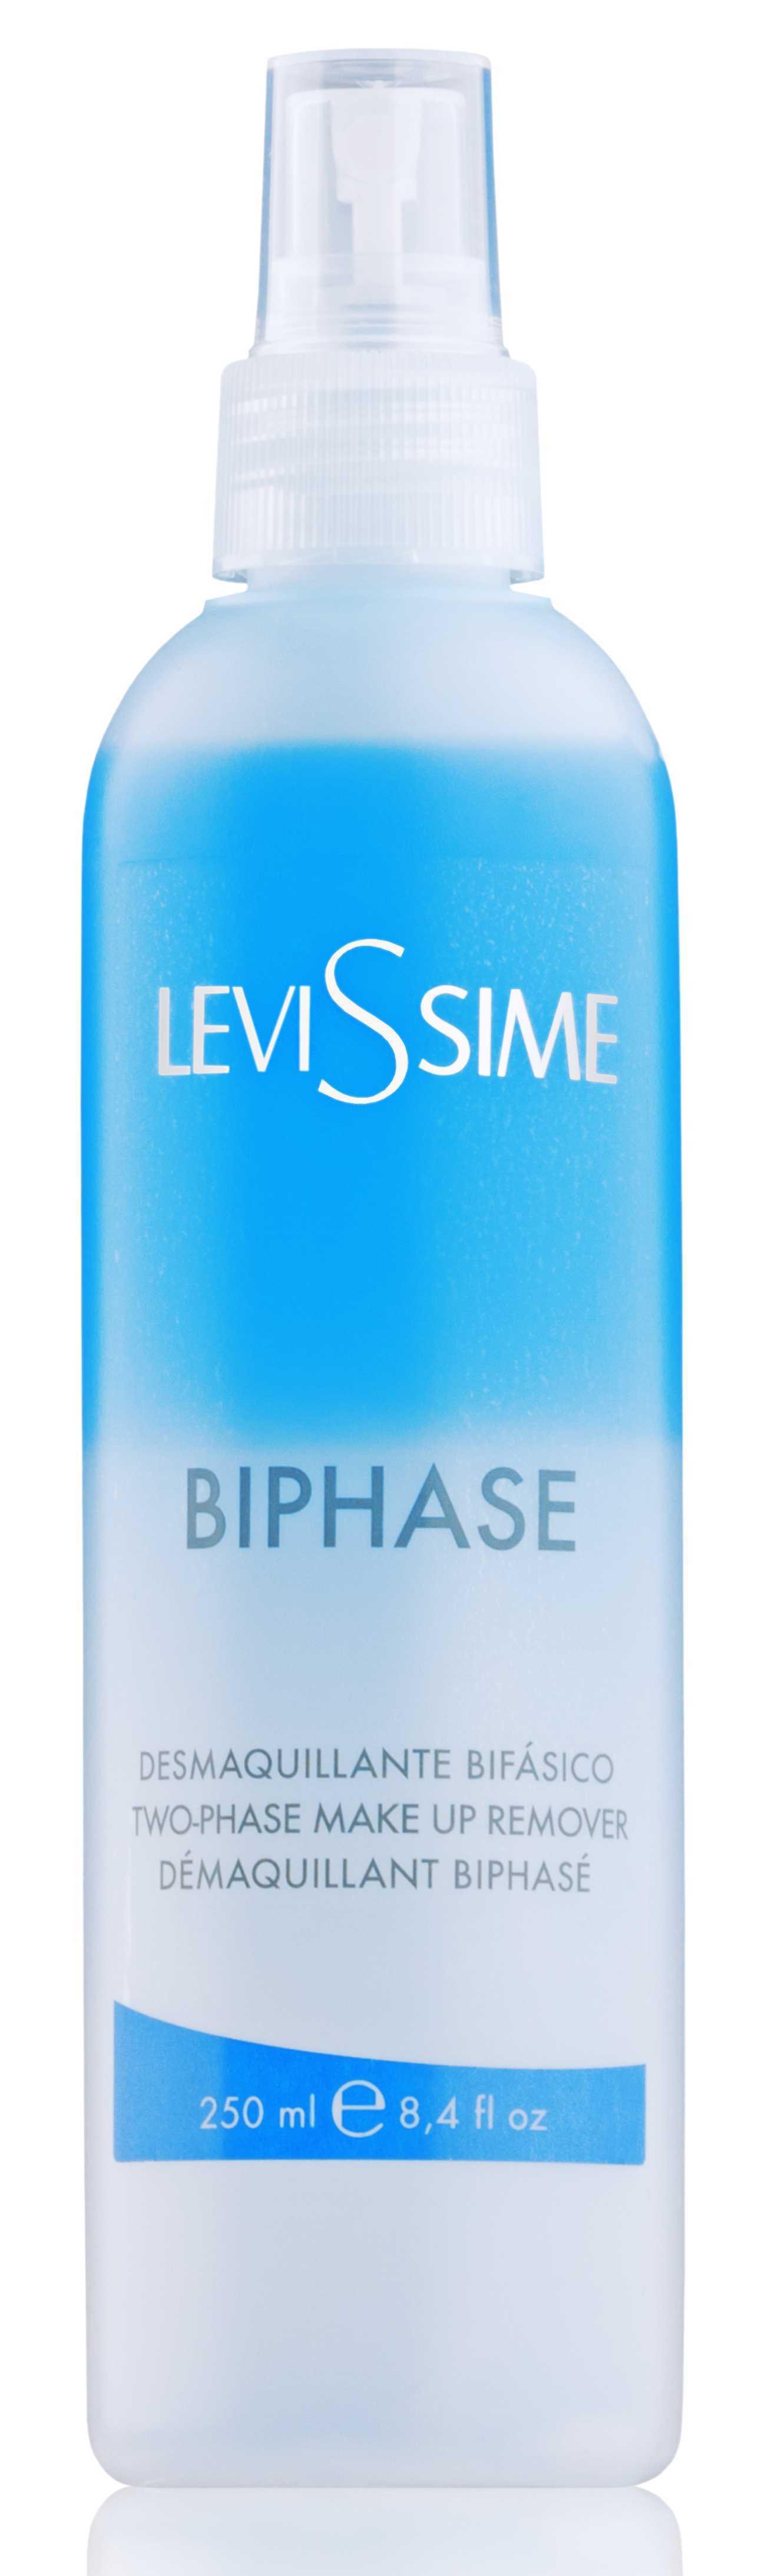 LEVISSIME Средство двухфазное для удаления макияжа / Bi-Phase Make-Up Remover 250 мл - Лосьоны